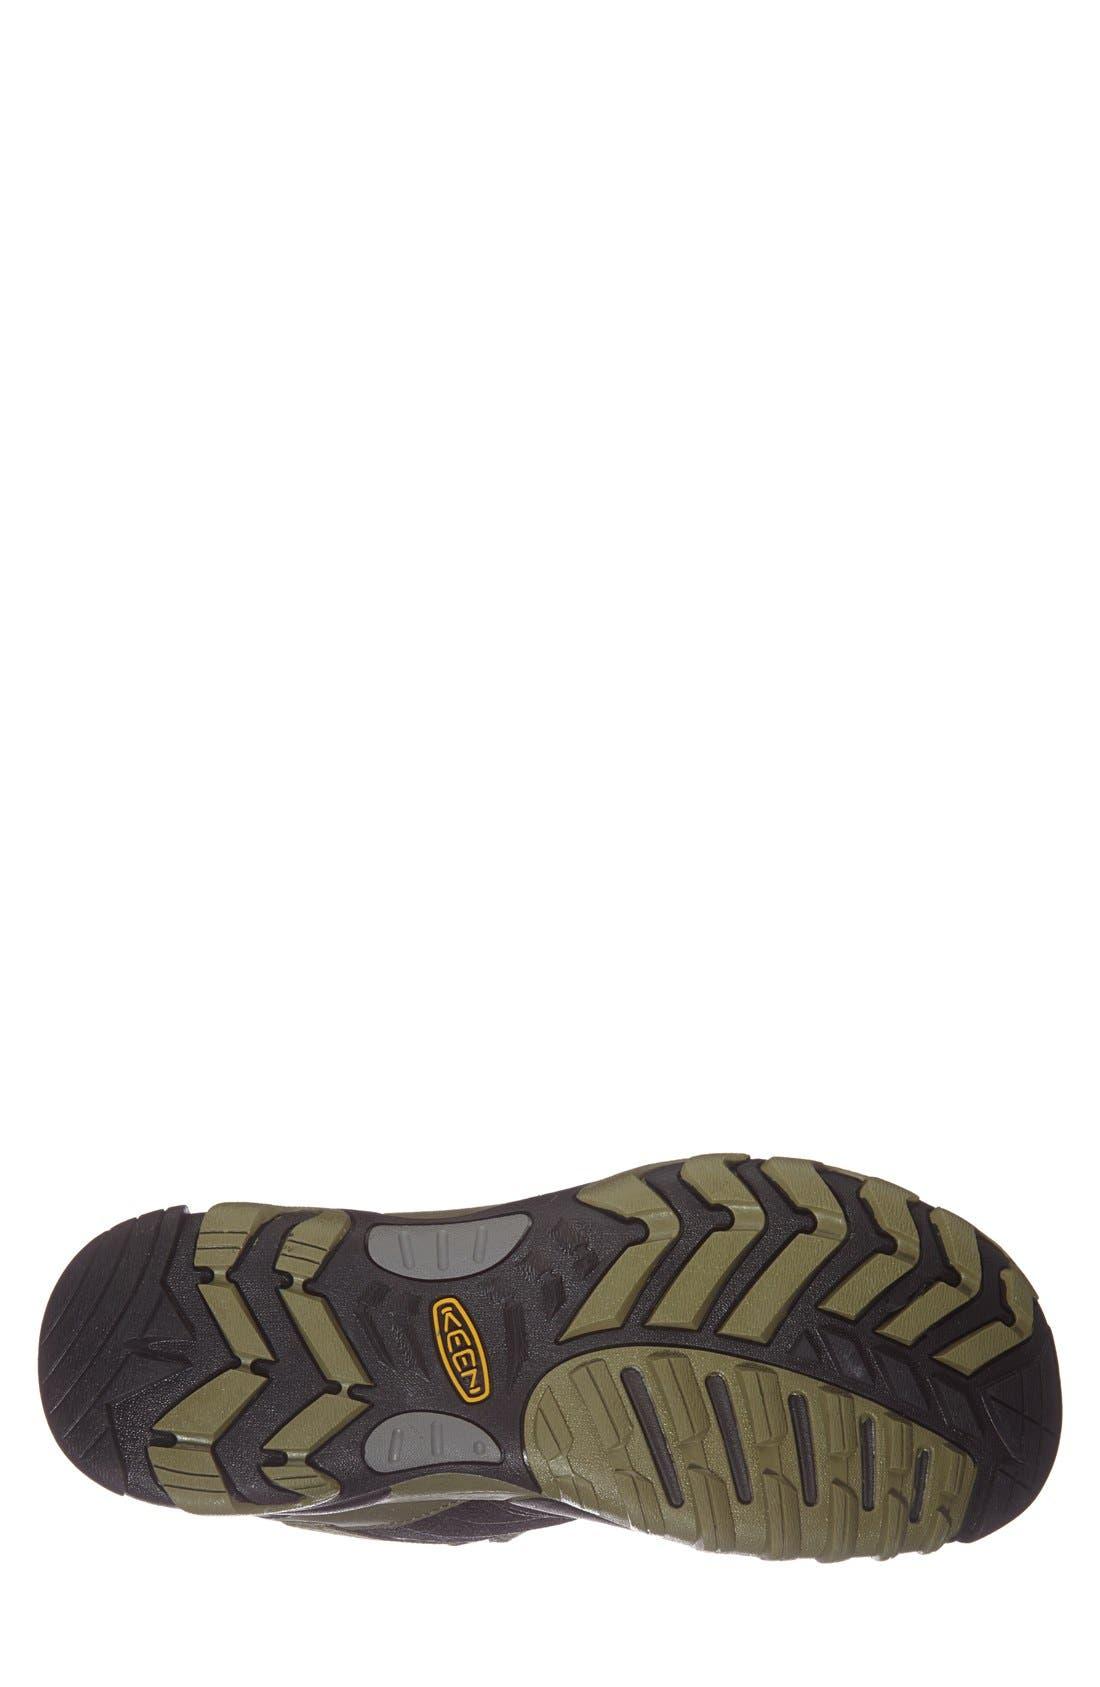 'Marshall WP' Hiking Shoe,                             Alternate thumbnail 4, color,                             001